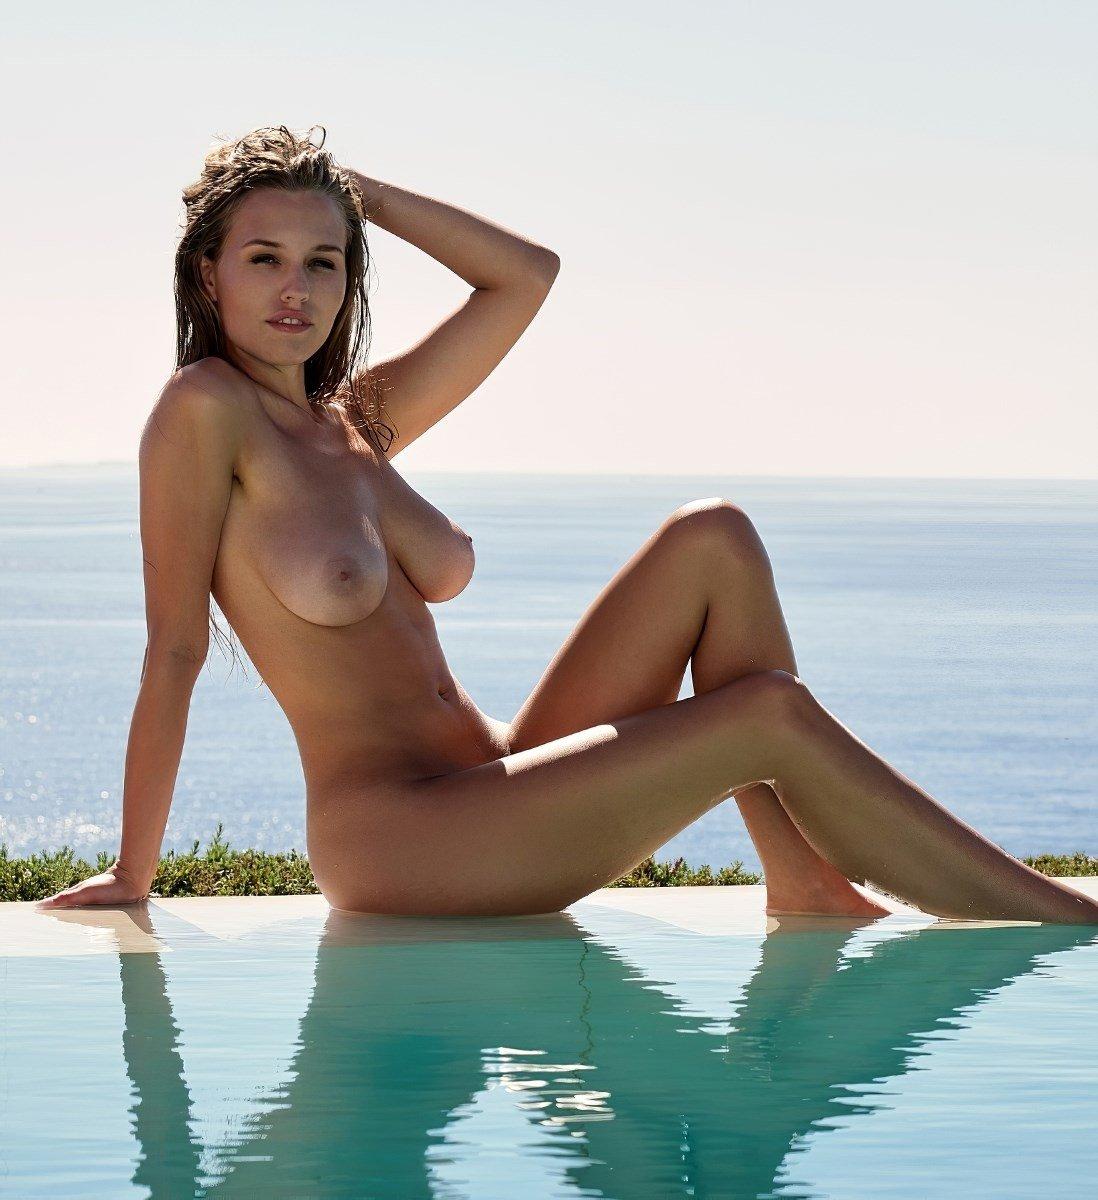 Laura Muller Nude Playboy Photo Shoot The Sex Scene